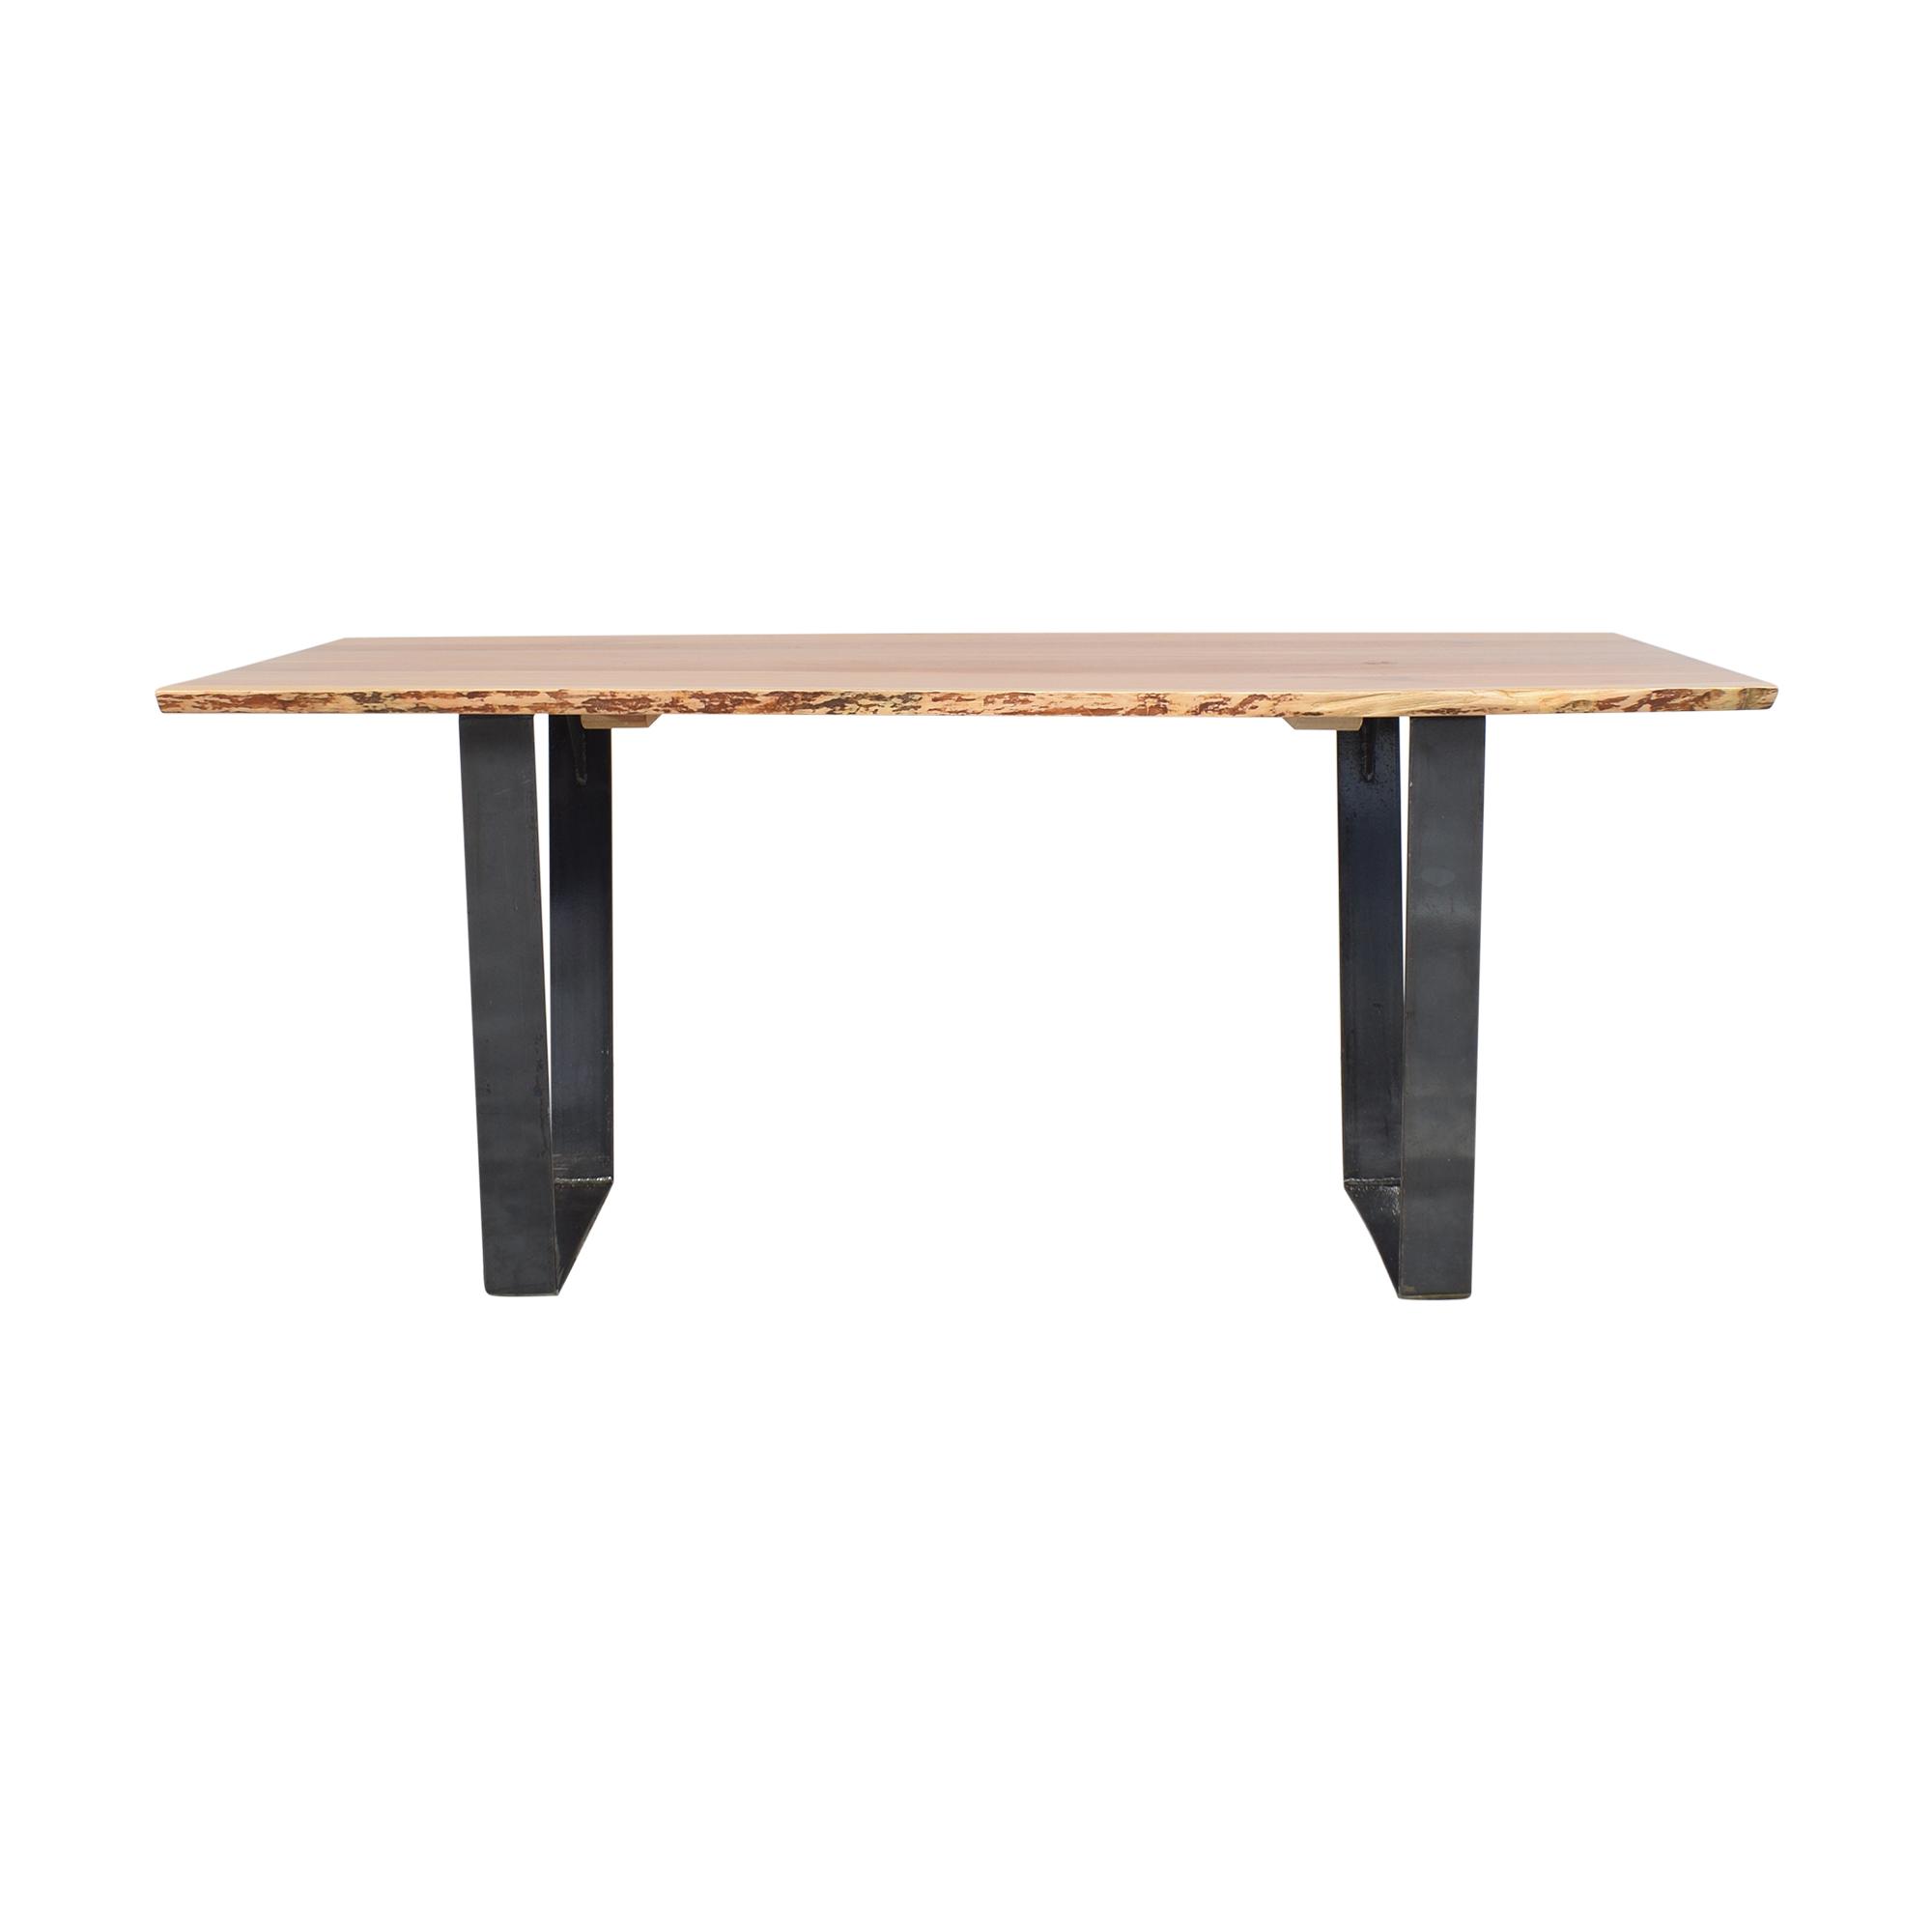 shop Contemporary Trends Scandinavian-Style Dining Table Contemporary Trends Tables